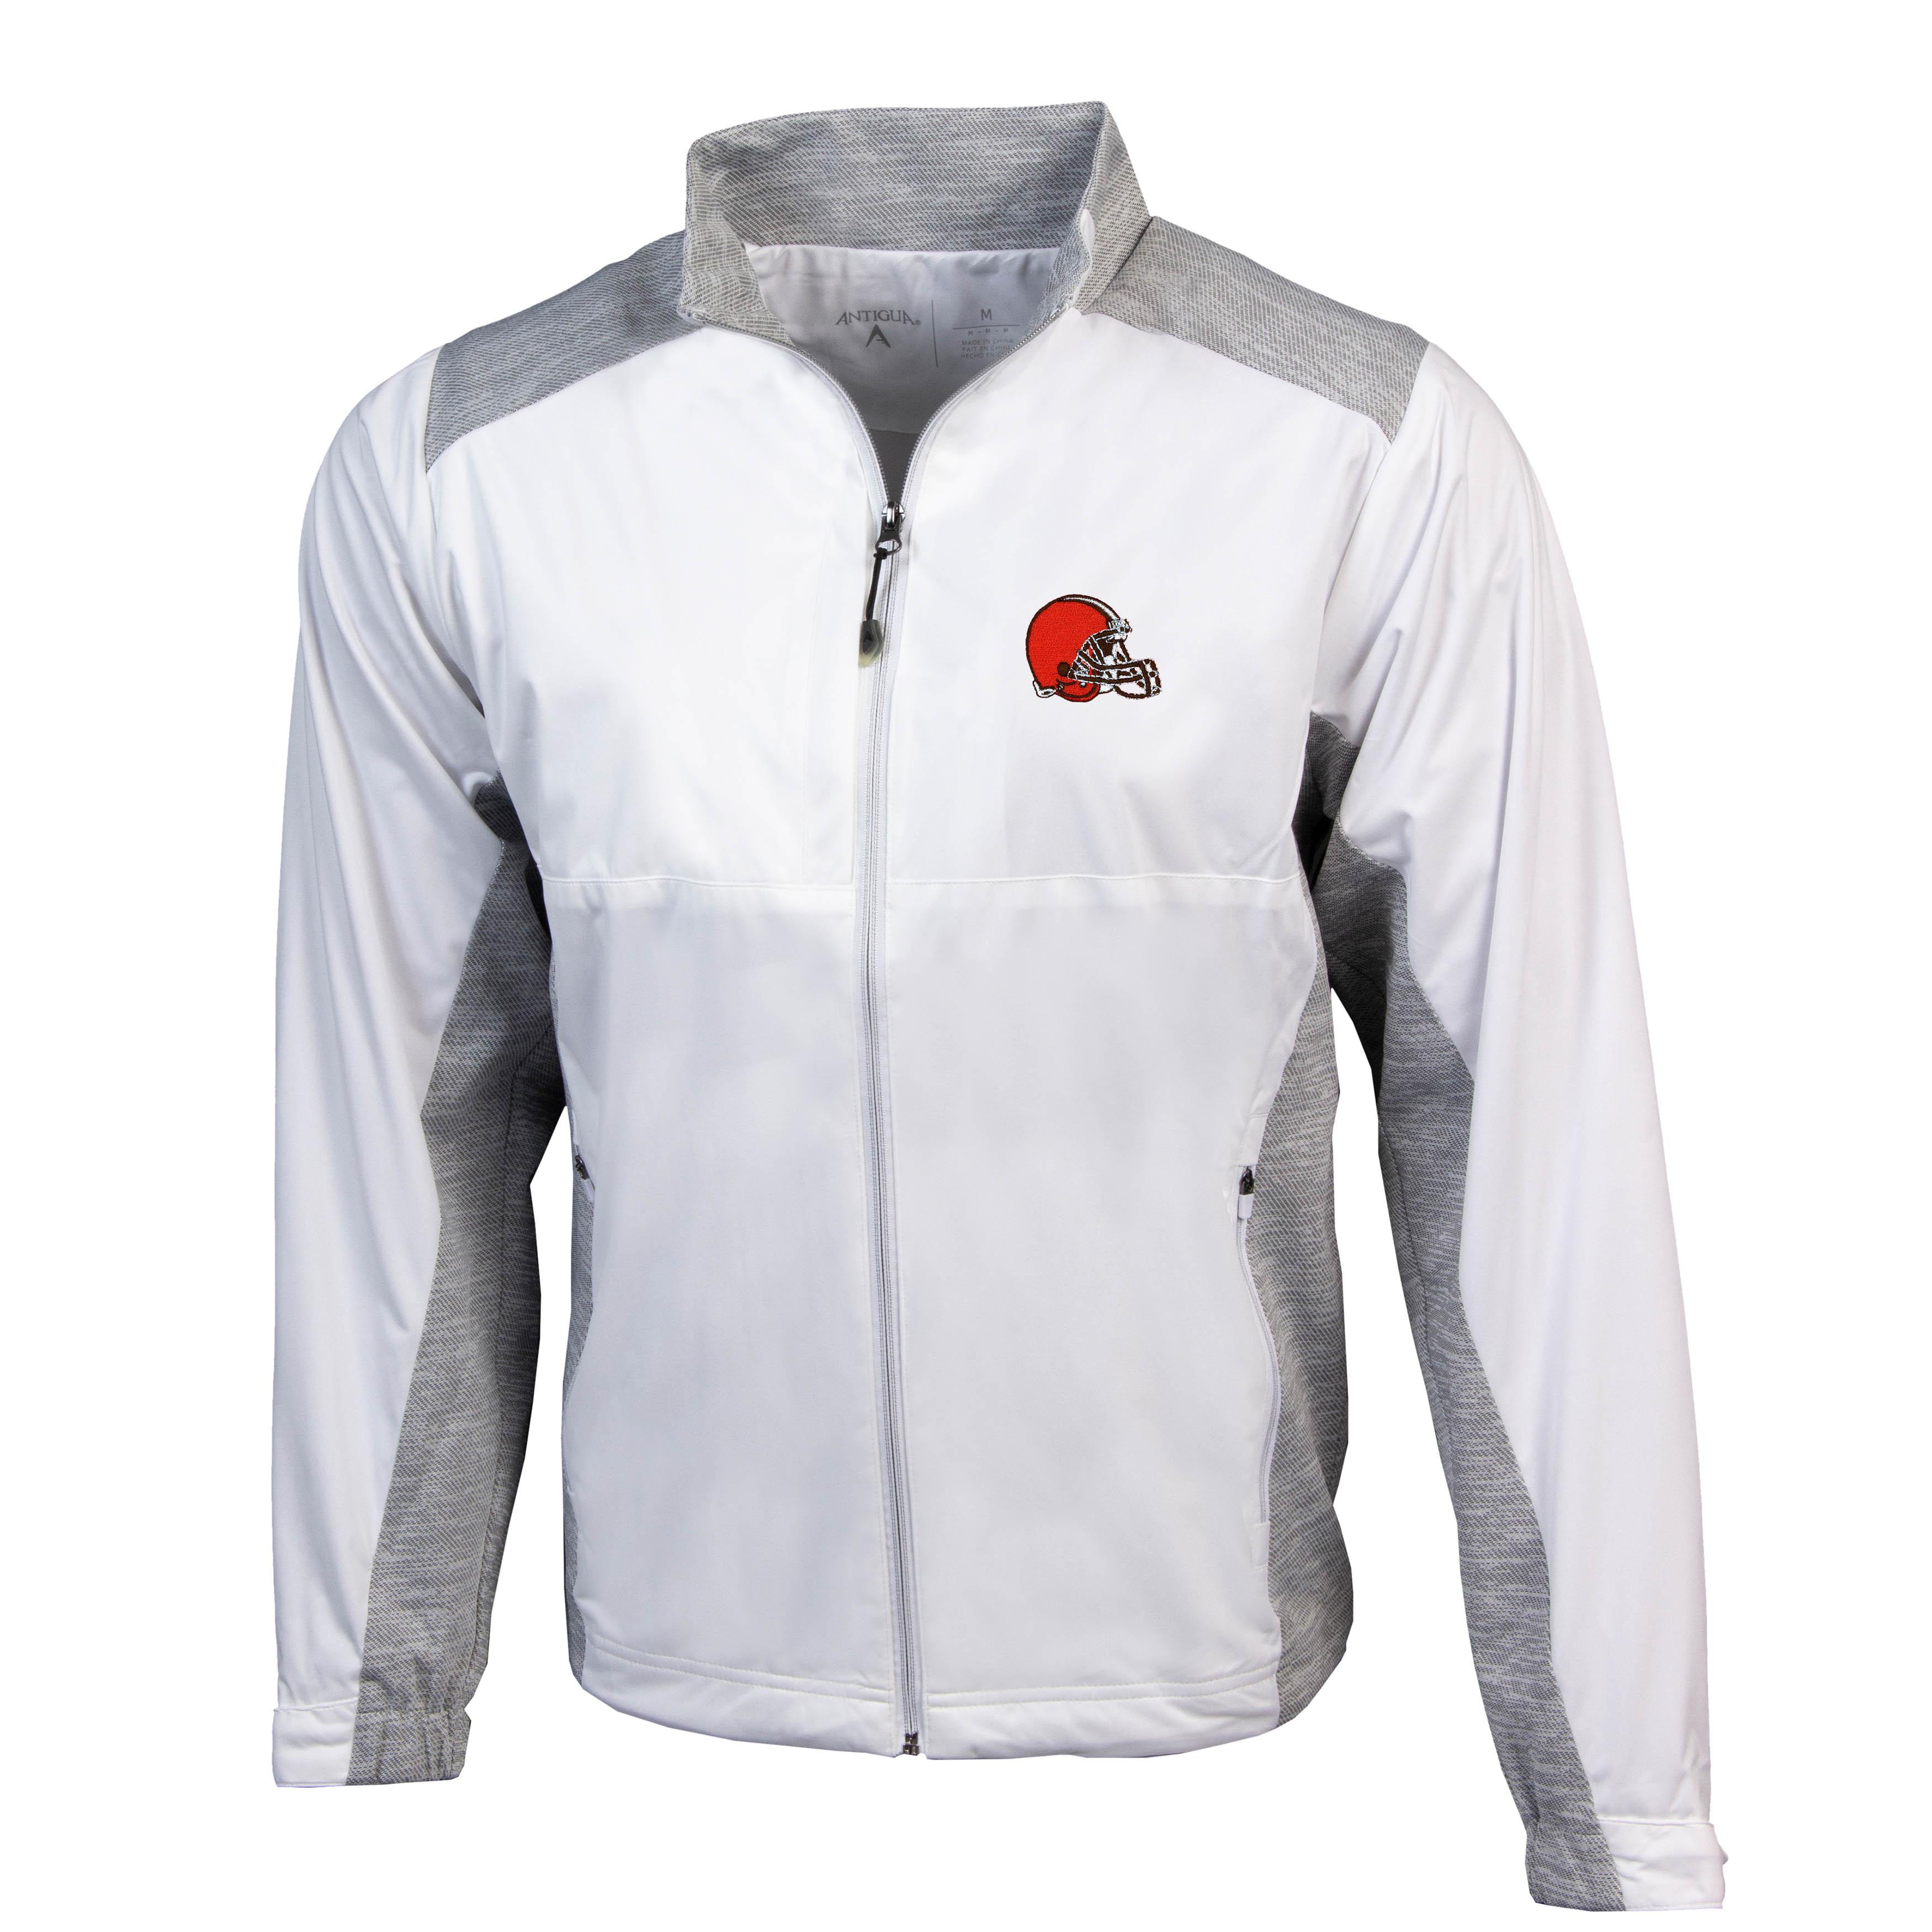 Cleveland Browns Antigua Revolve Full-Zip Jacket - White